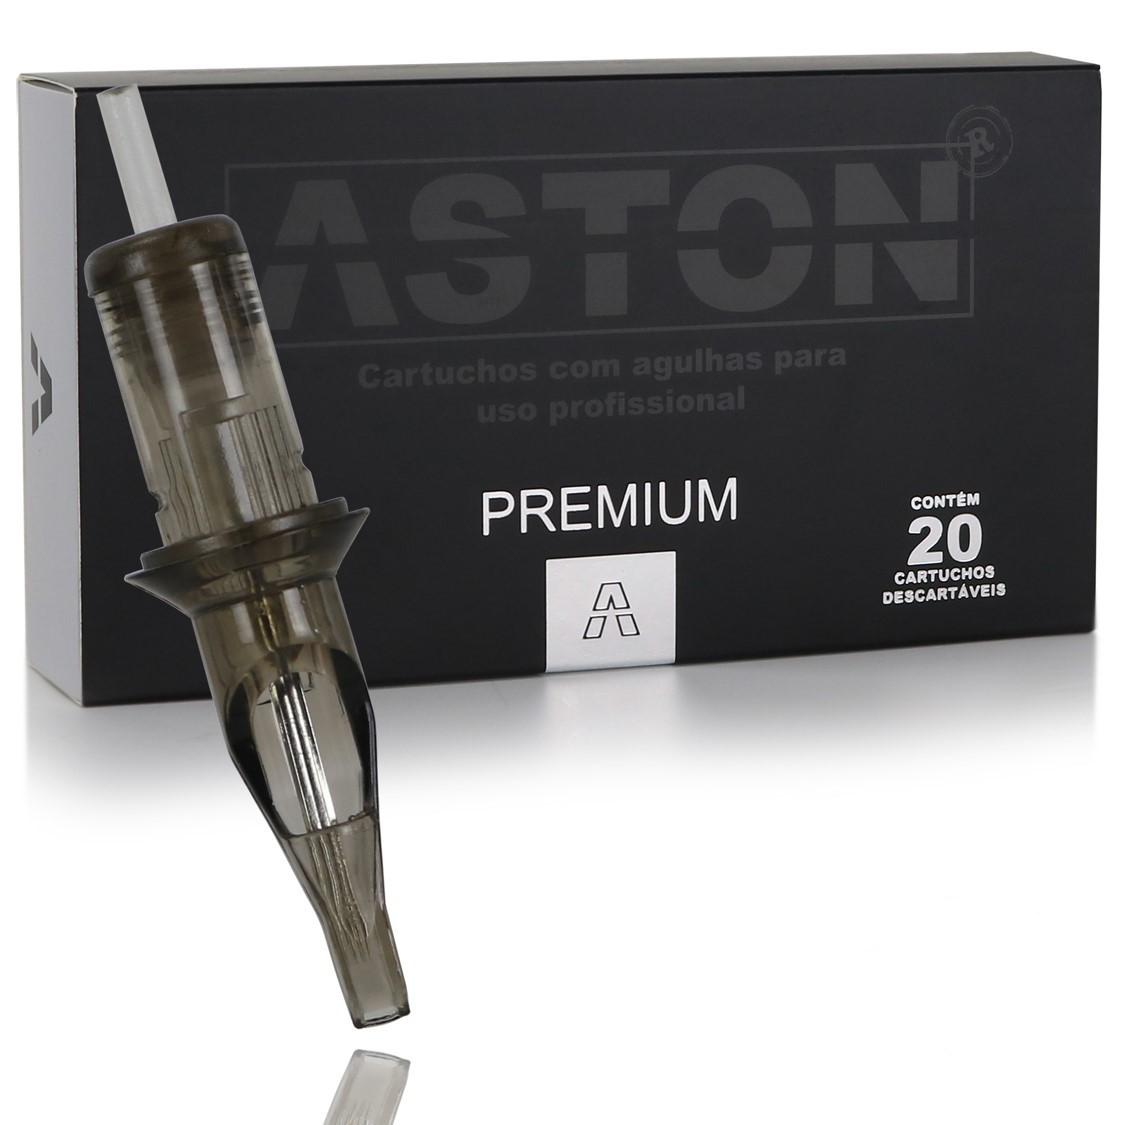 CAIXA CARTUCHO ASTON PREMIUM PINTURA MG (20 UN) - 1021MG